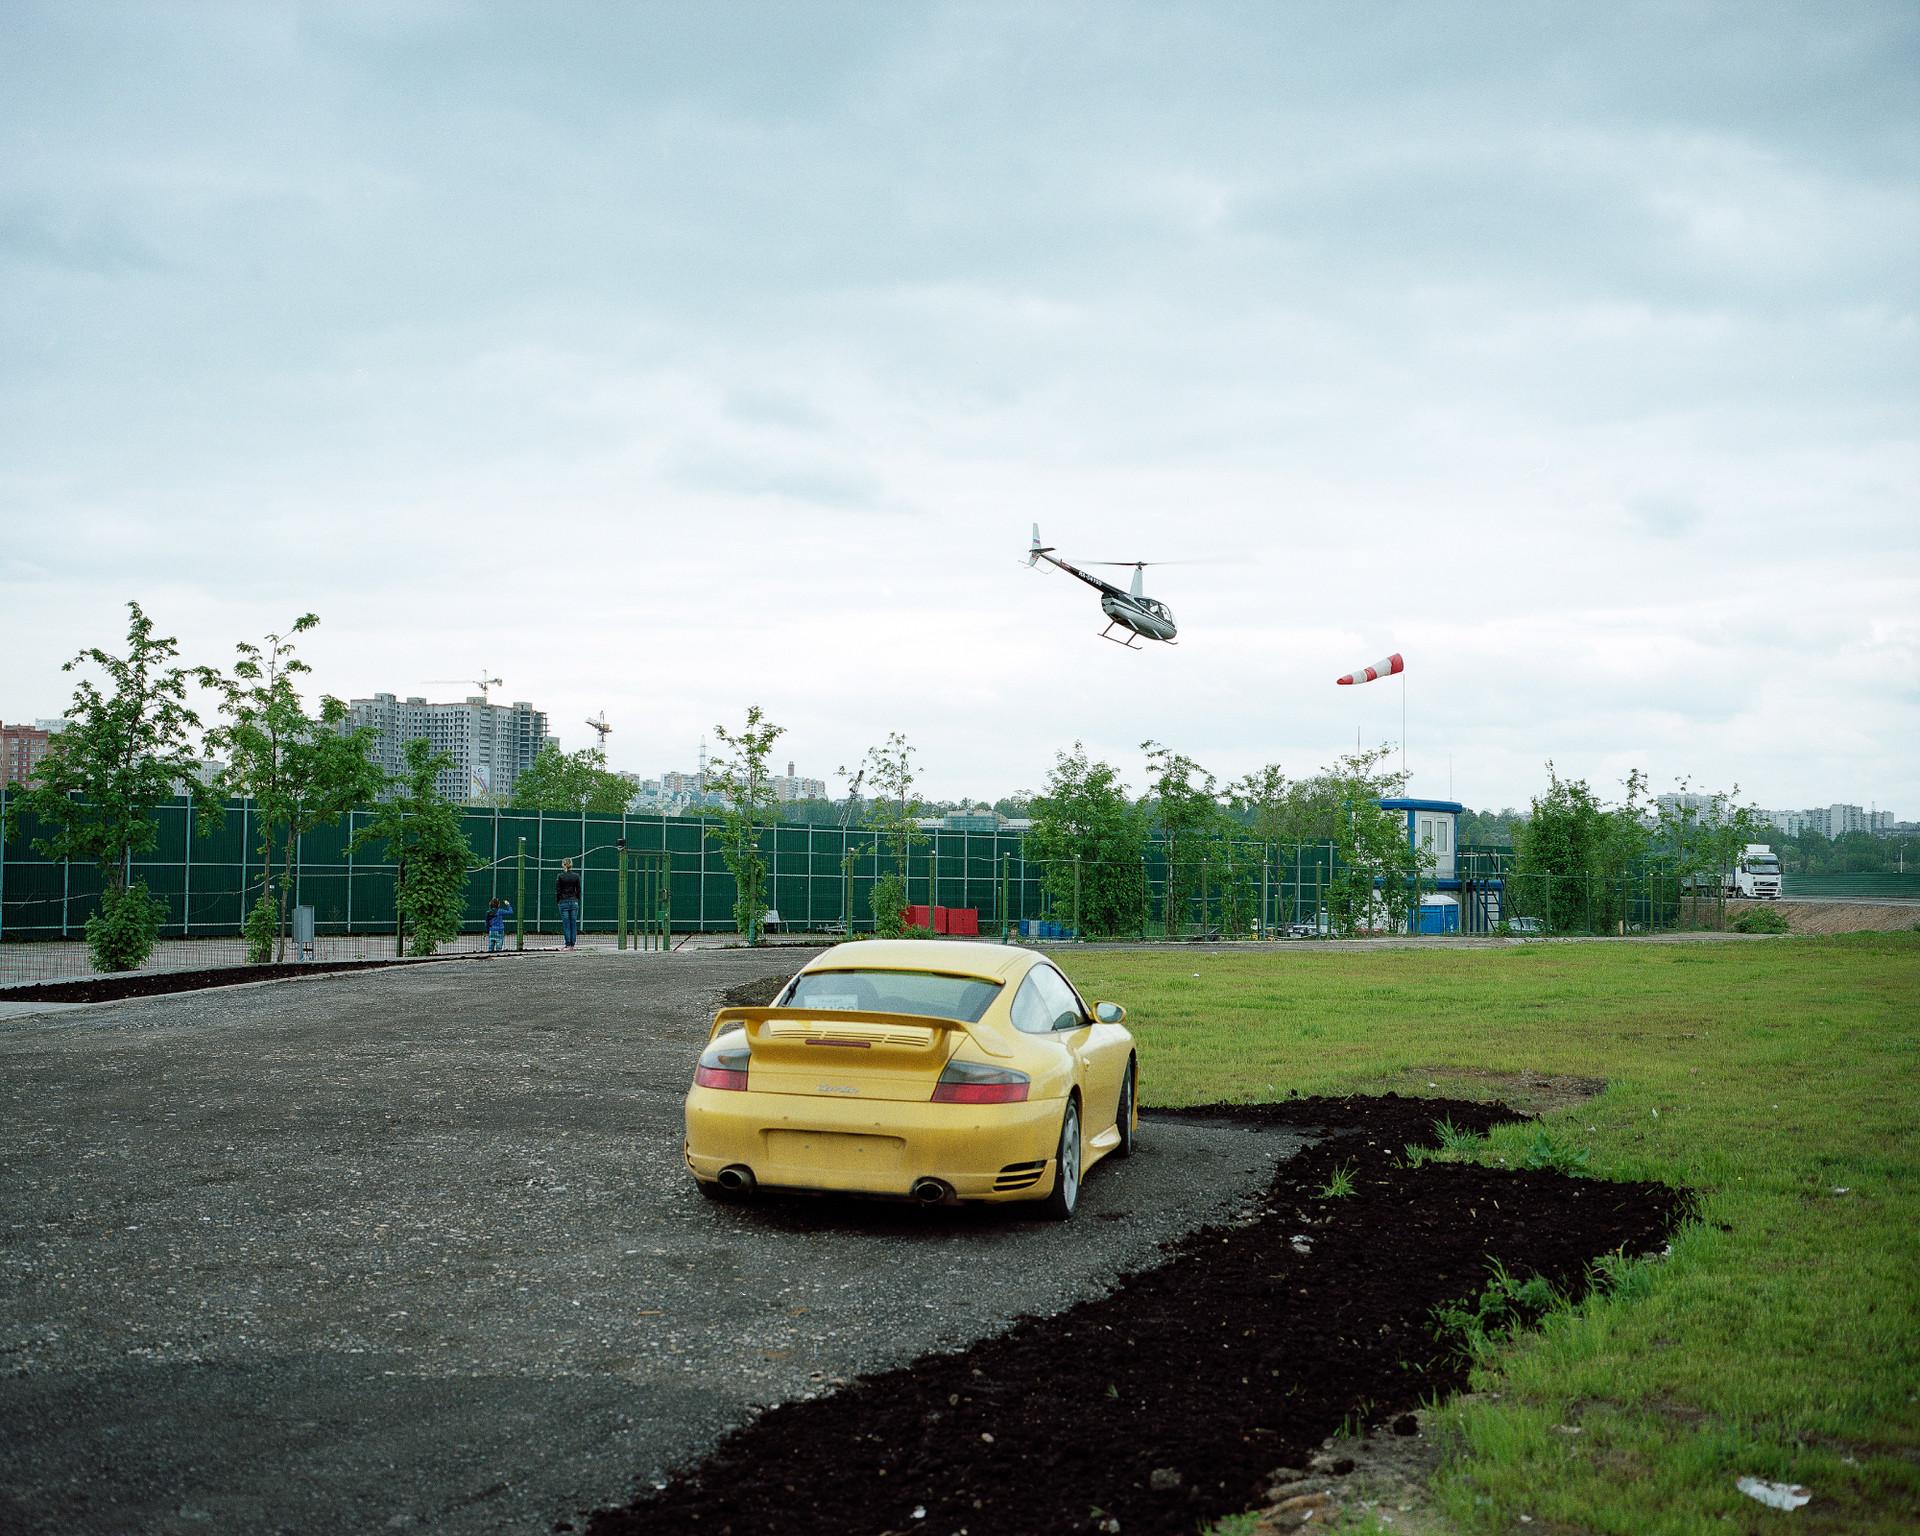 Petr Antonov, Alberi, auto, persone, arredo, Mosca, 2011